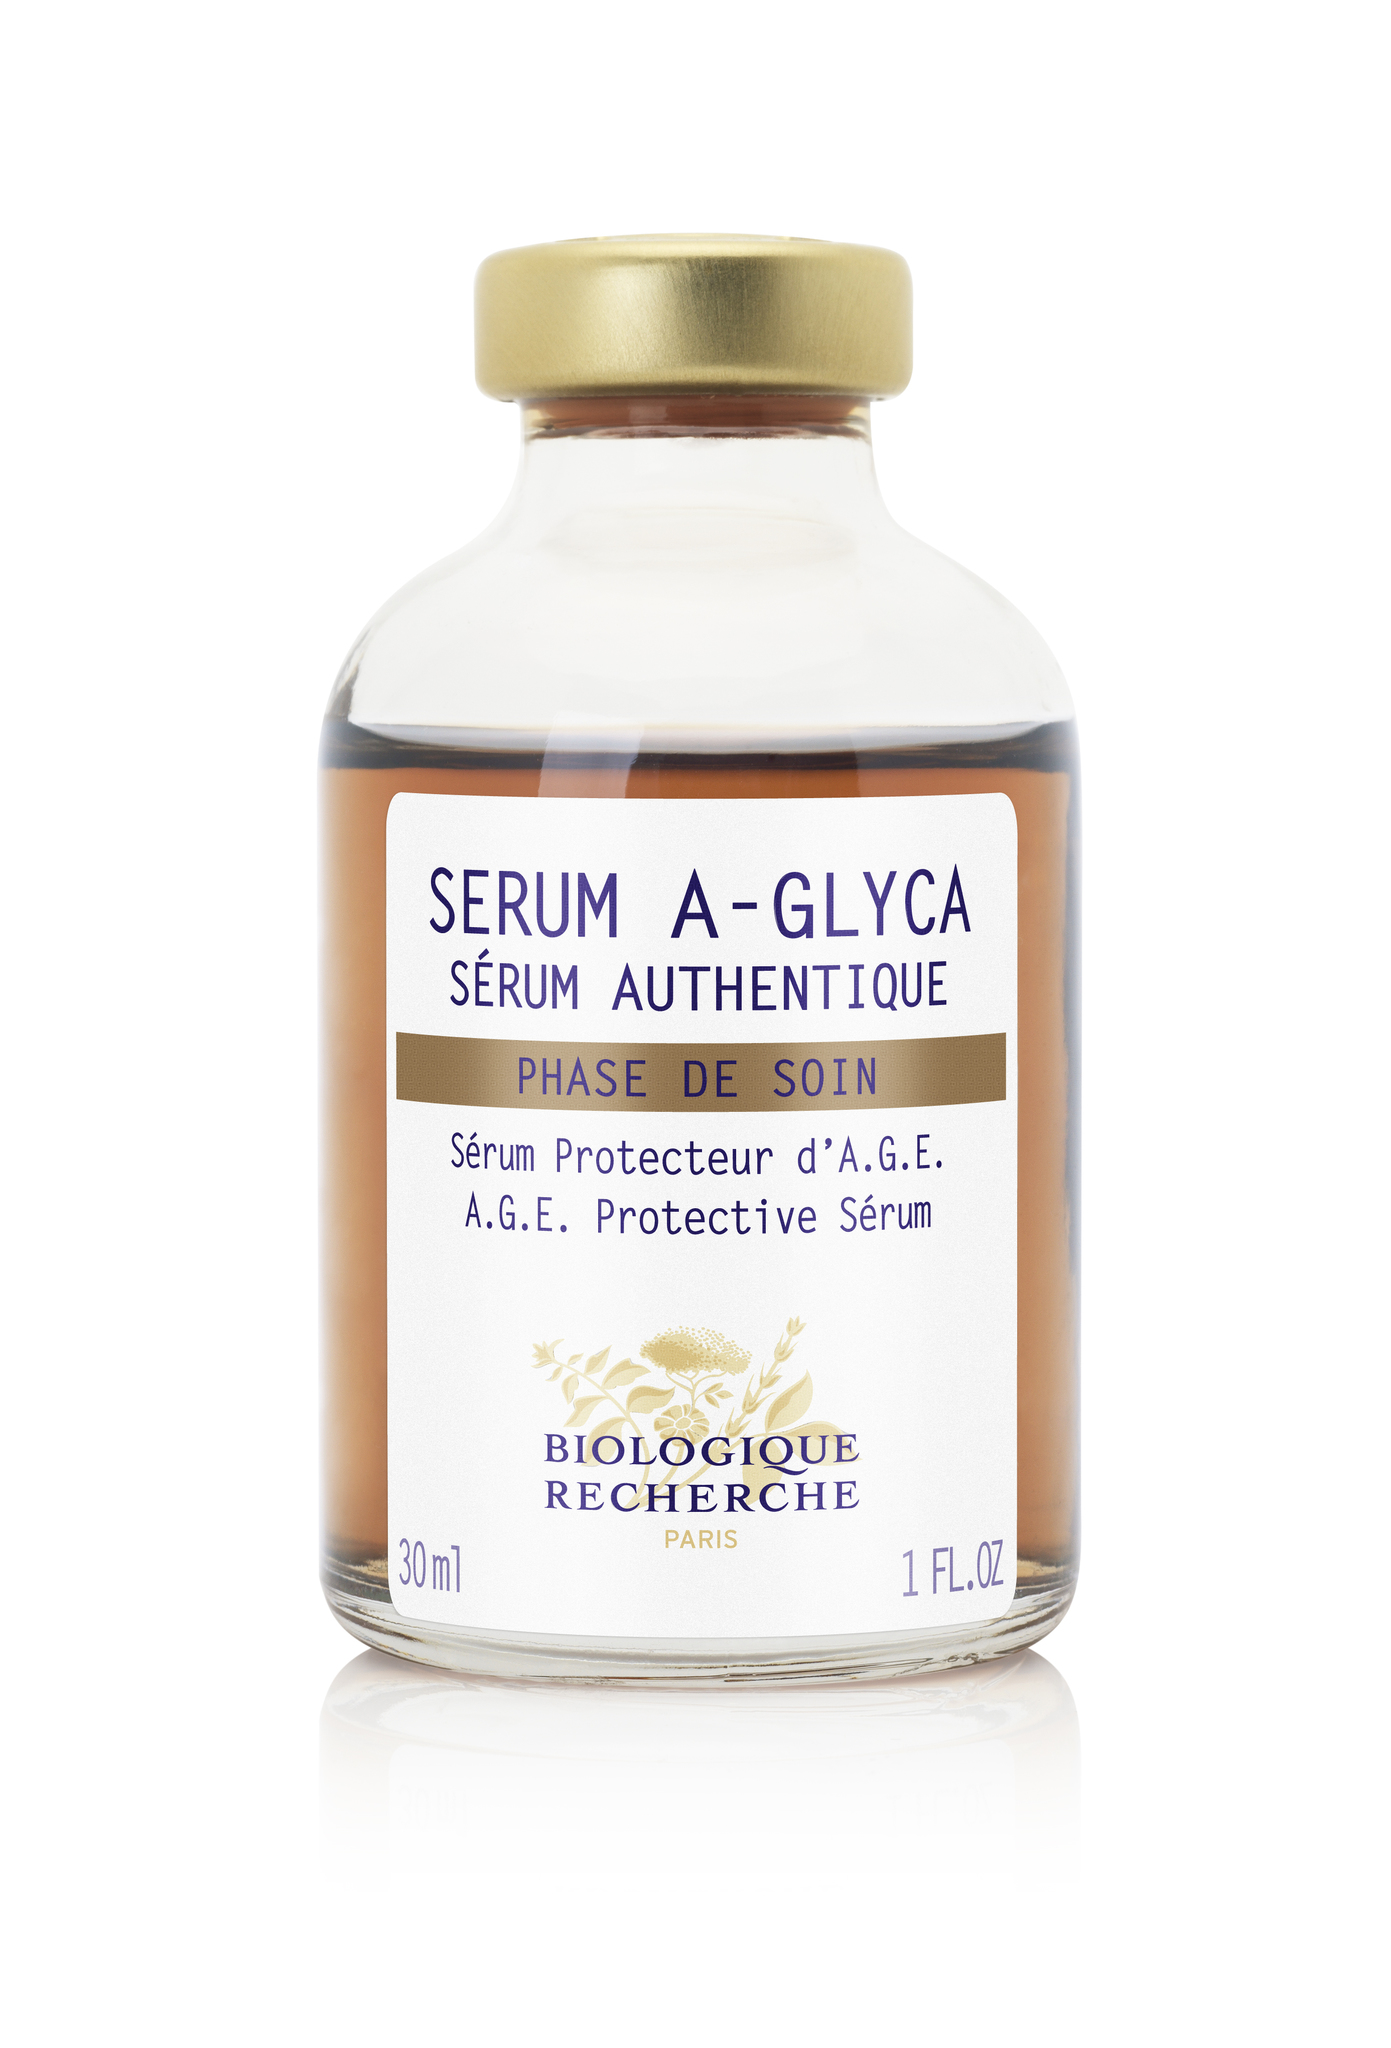 Сыворотка A.G.E. защитная для лица BIOLOGIQUE RECHERCHE Serum A-Glyca 30 мл